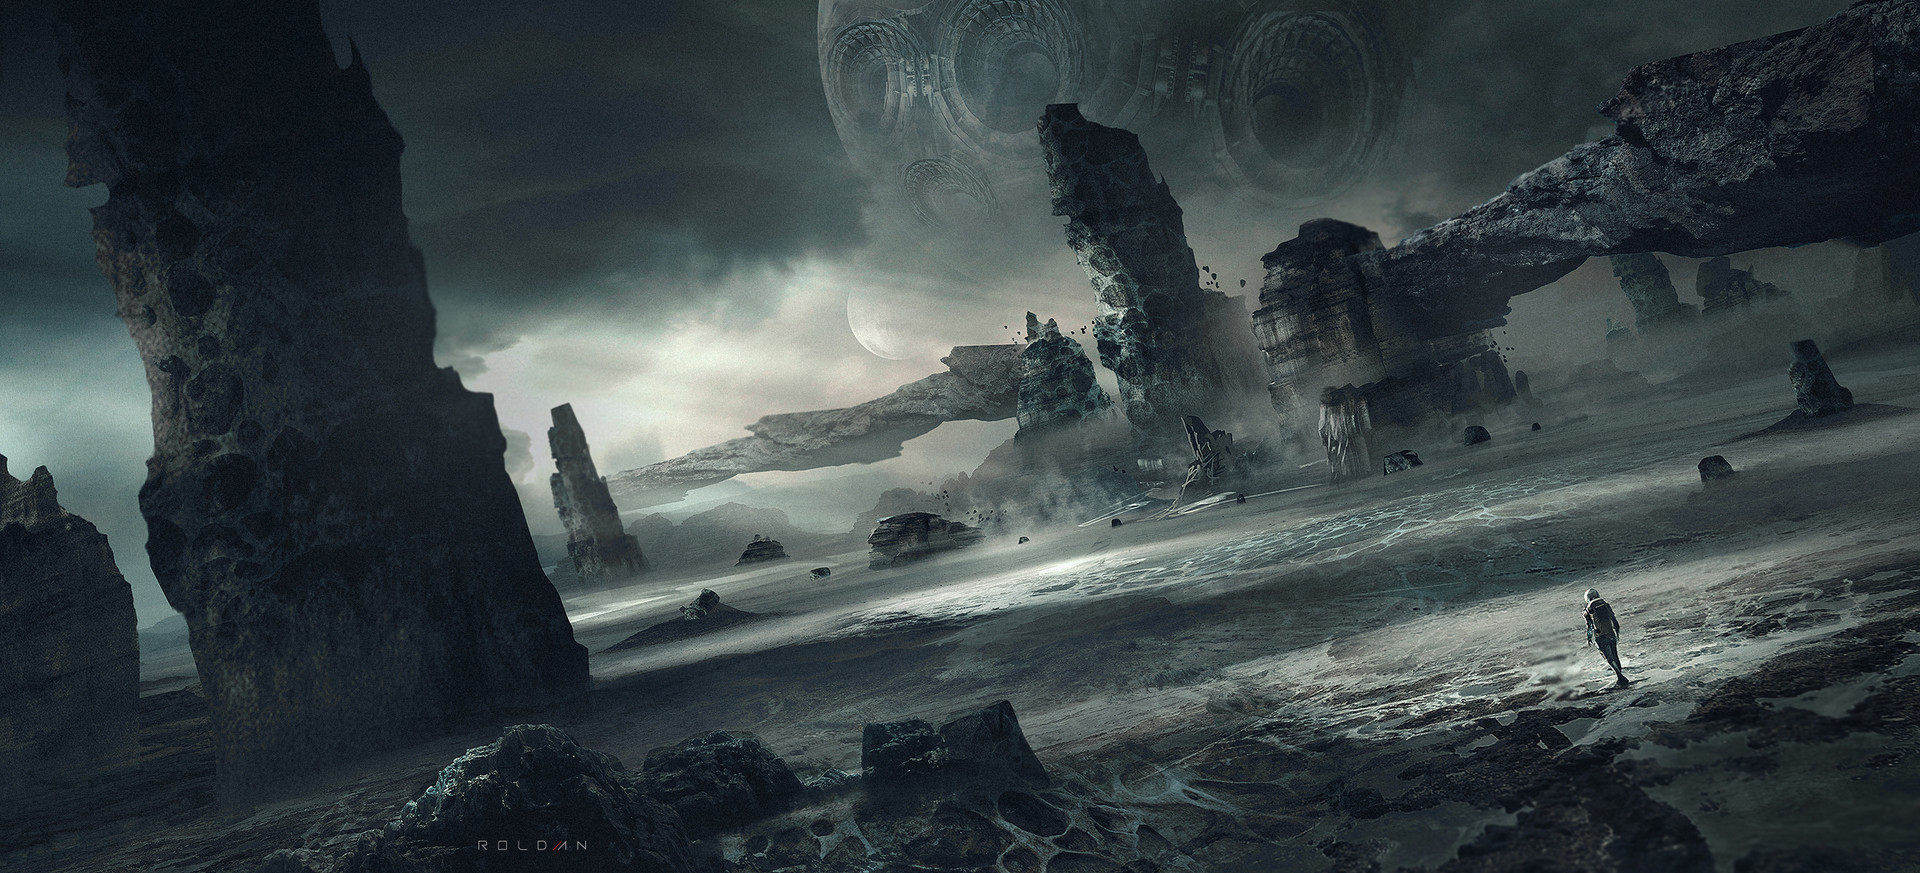 Juan pablo roldan alien world 12